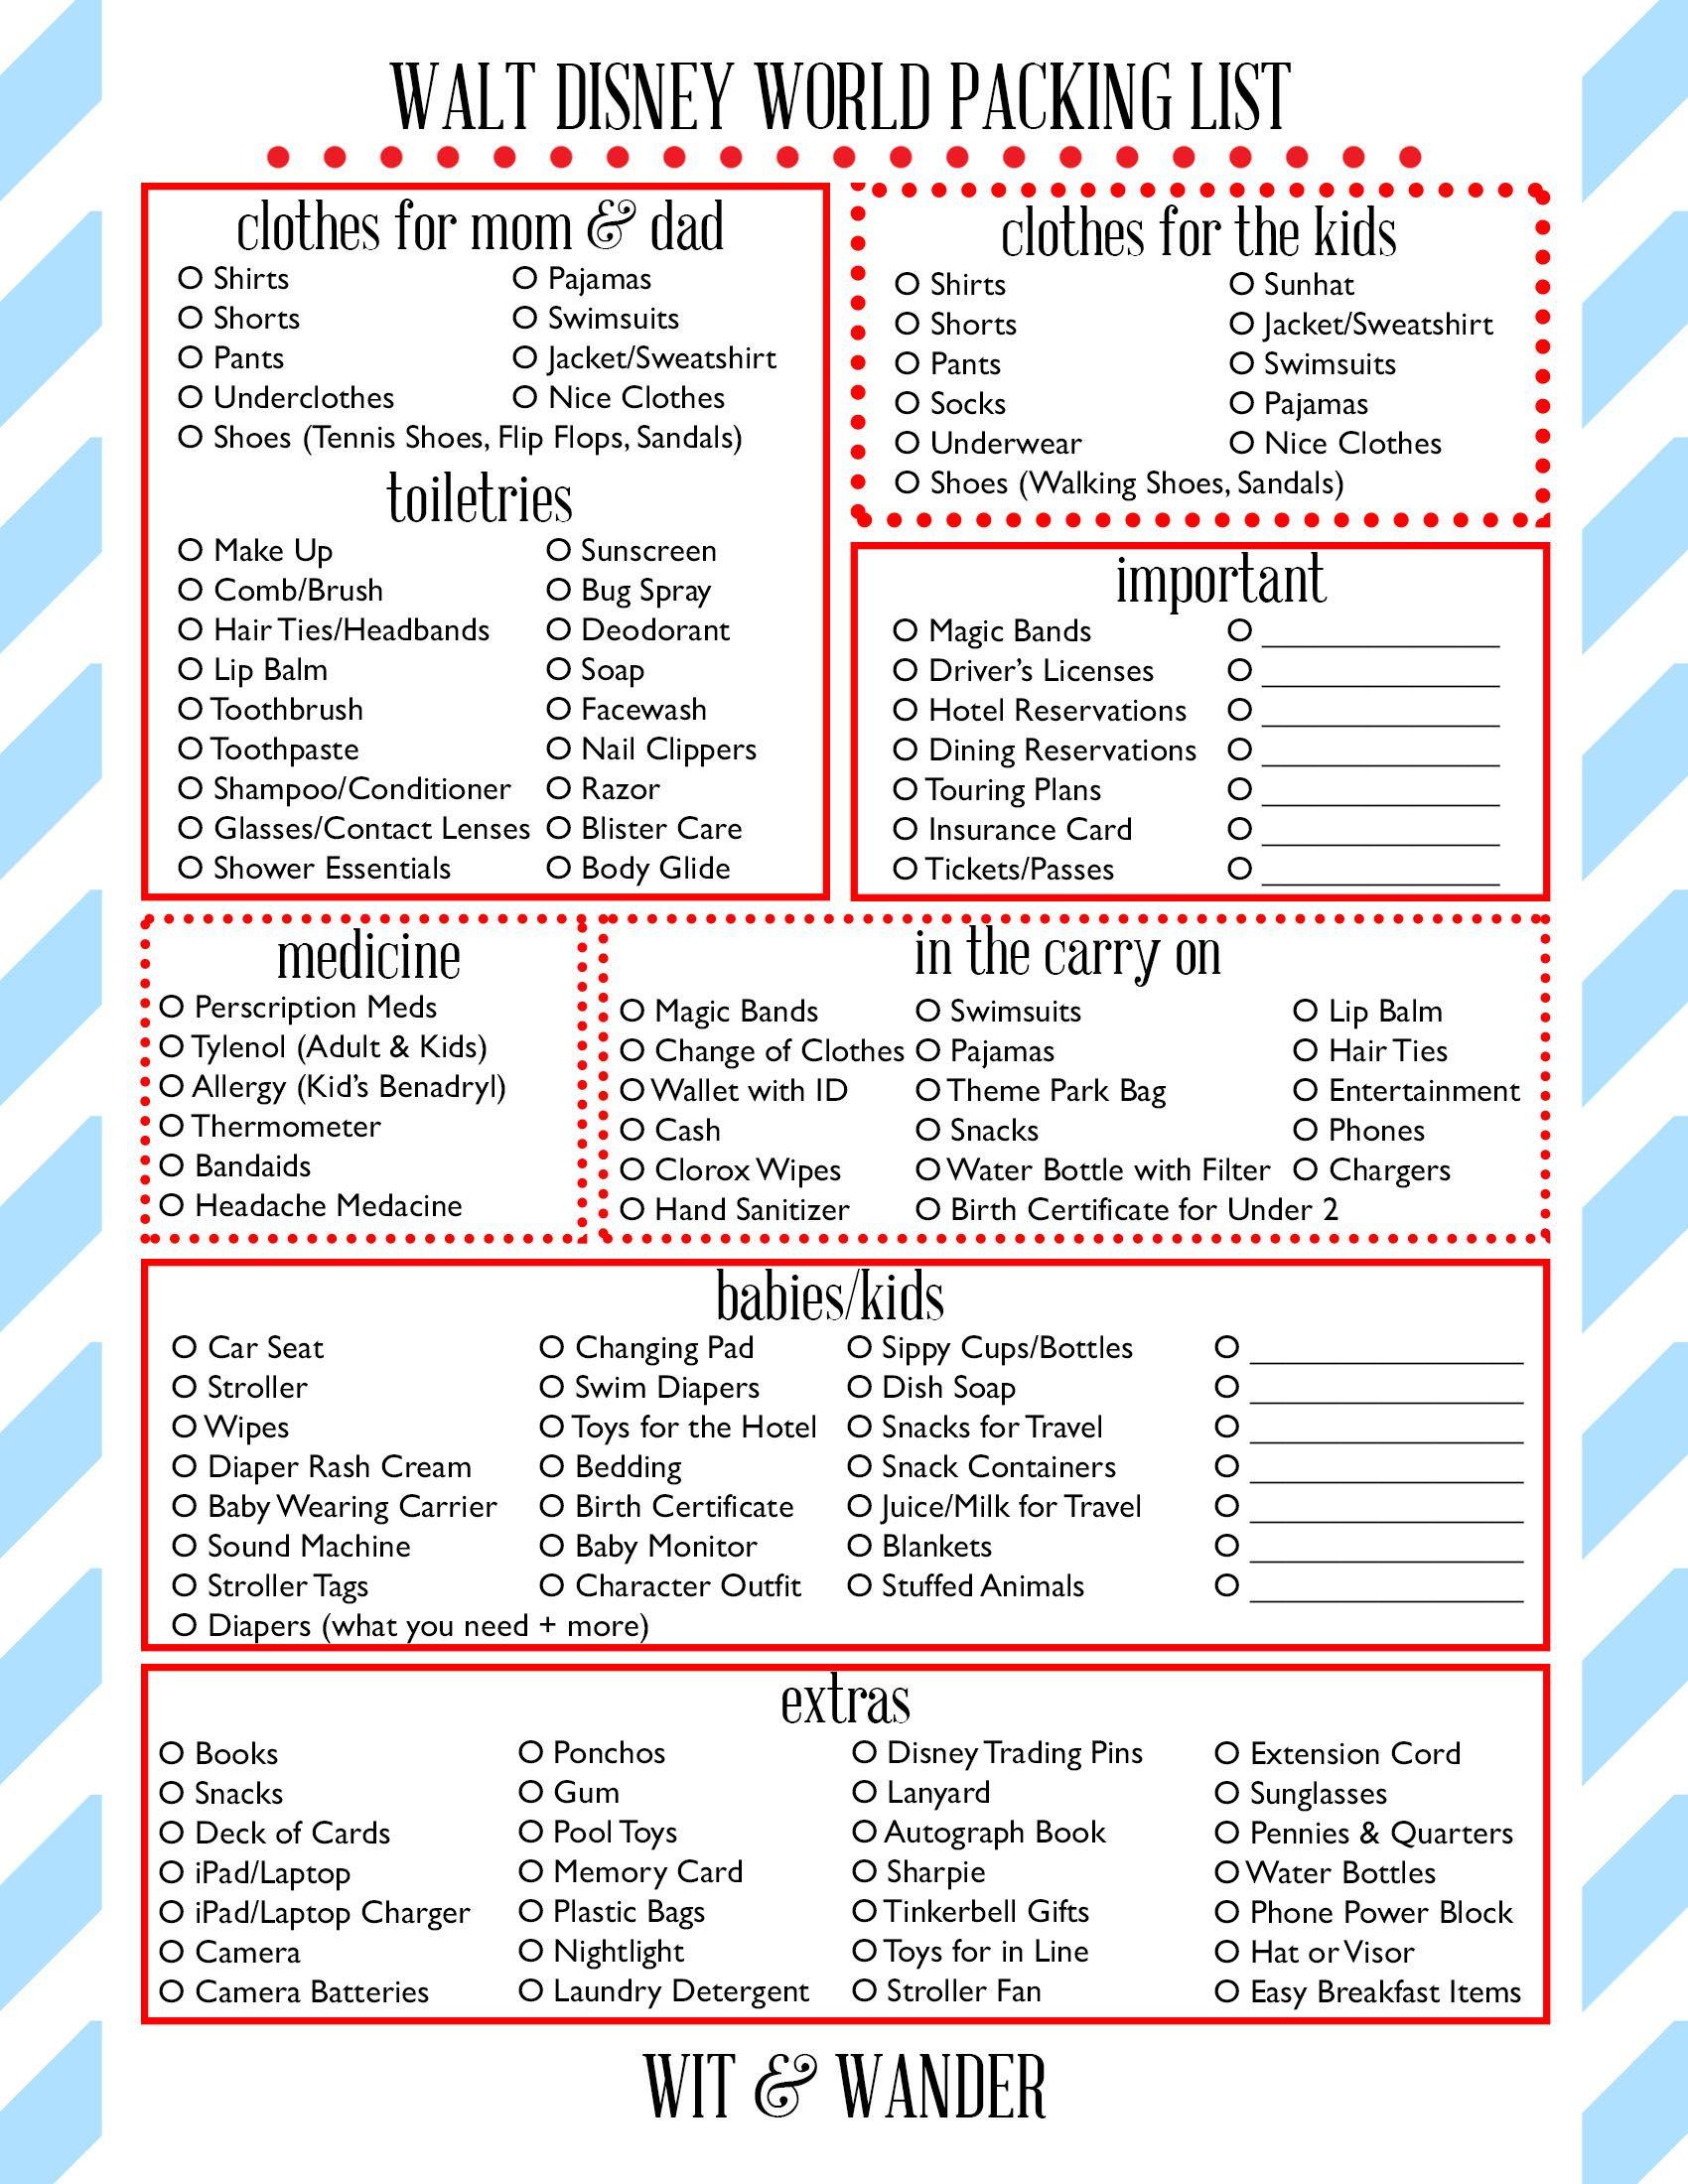 Walt Disney World Free Printables | Disney Packing List In